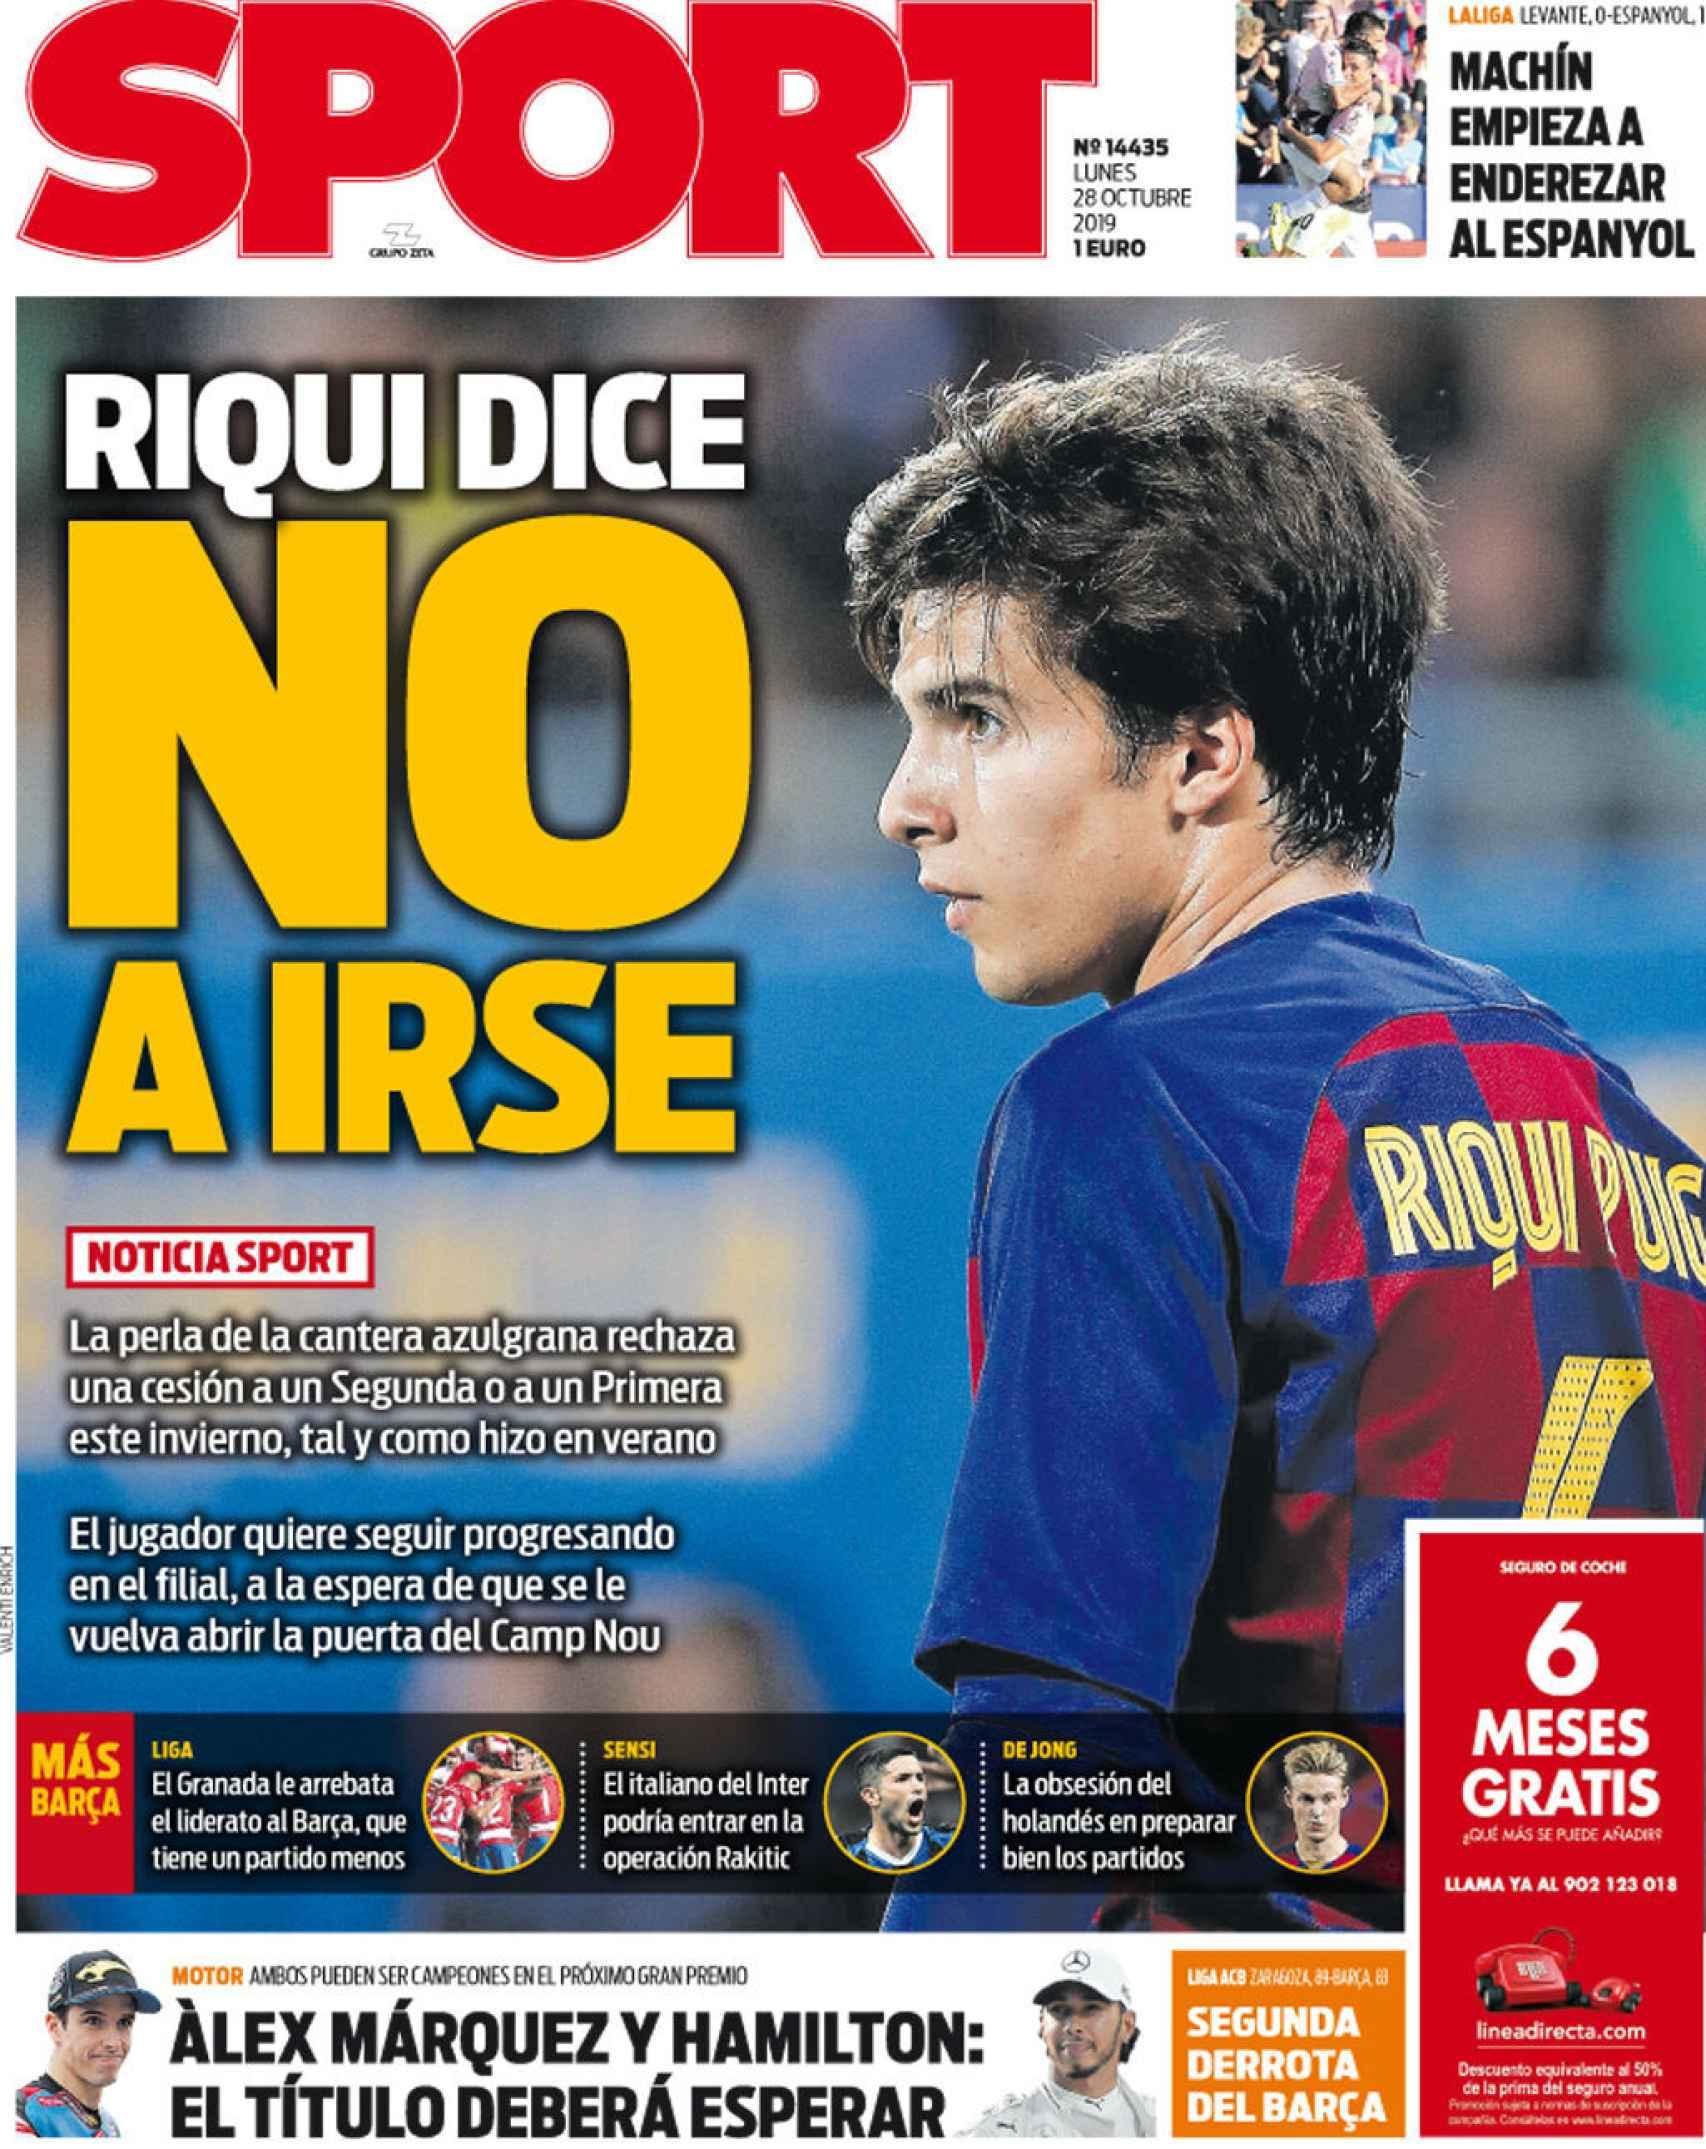 La portada del diario Sport (28/10/2019)